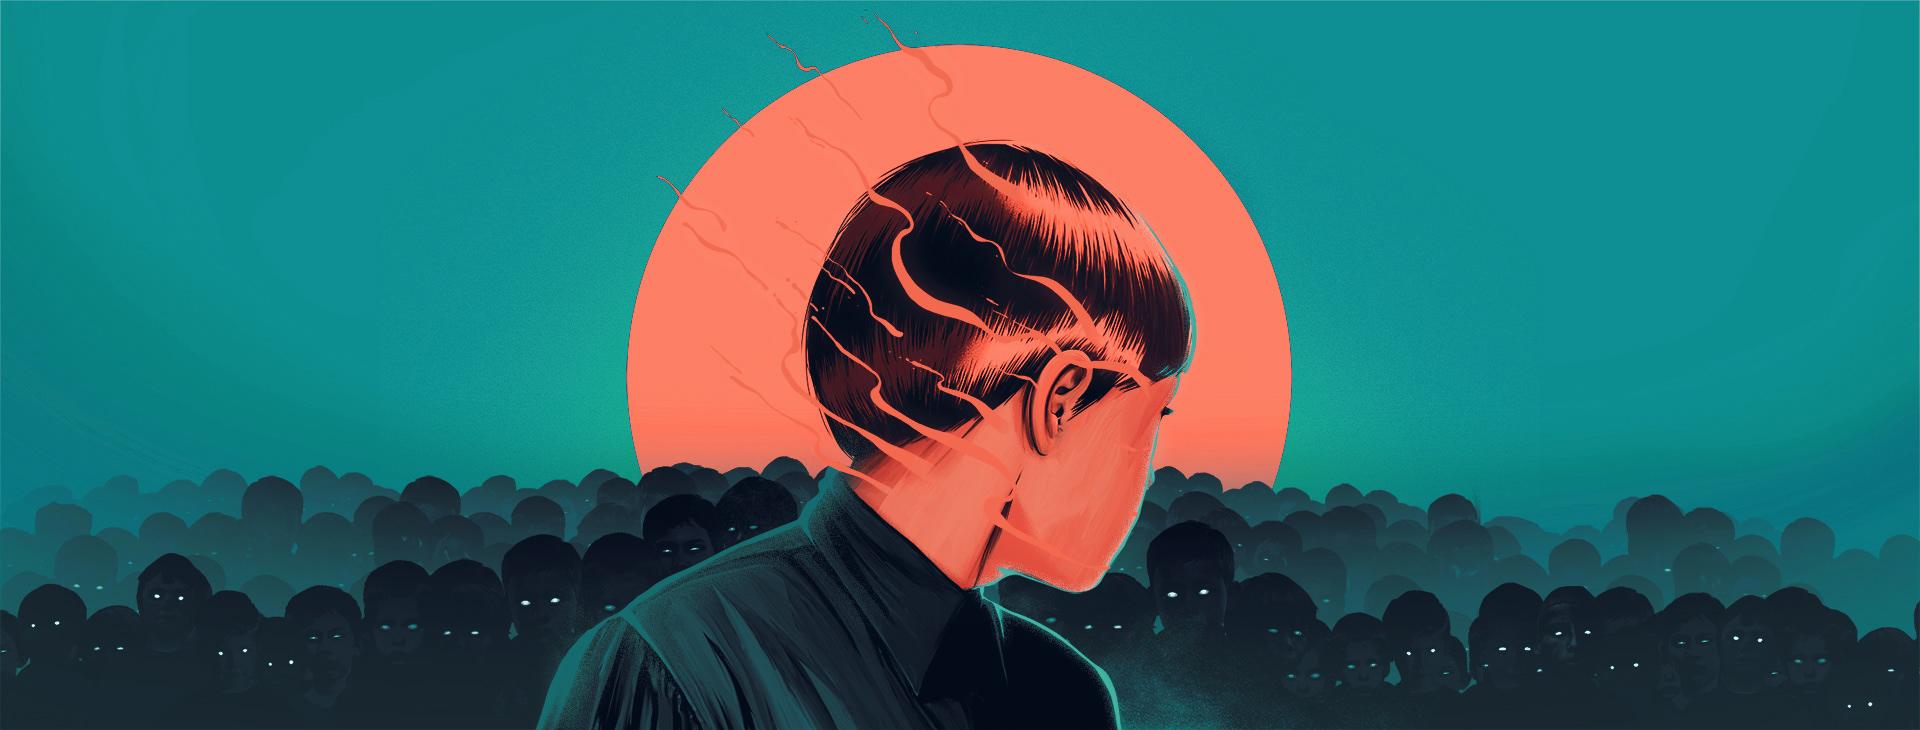 Music Album Cover Illustrations by El Diablo